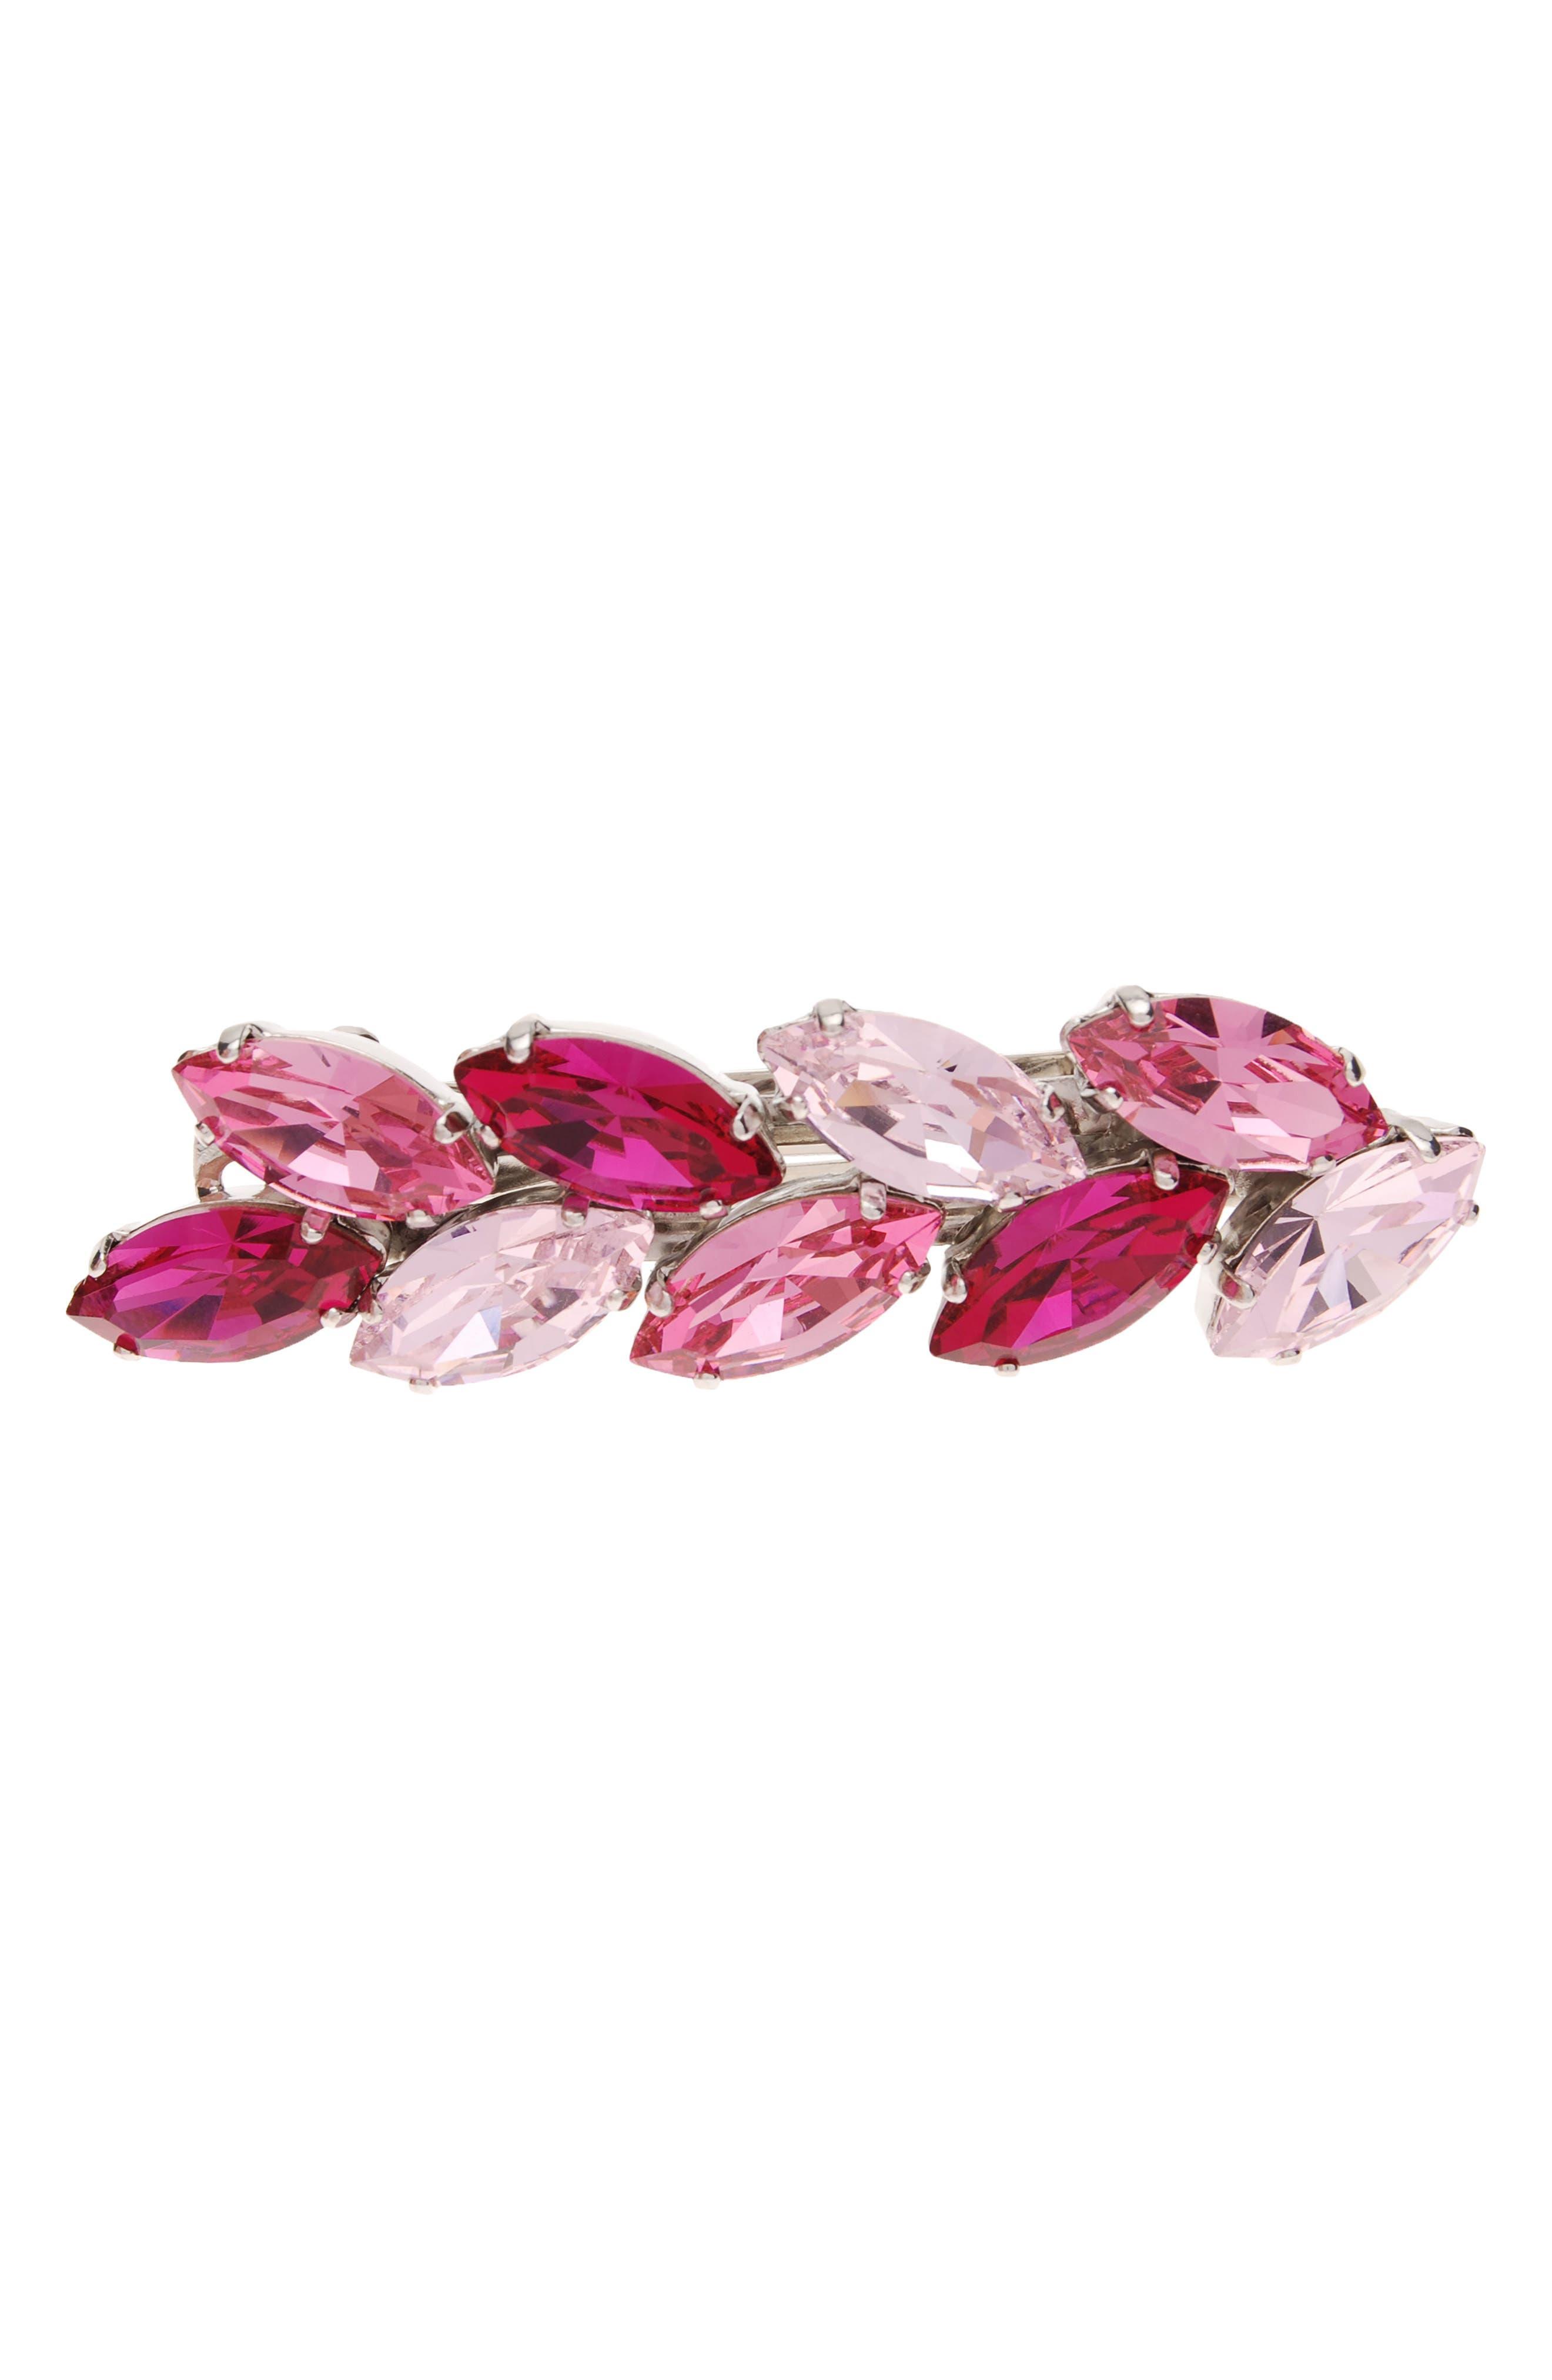 Small Ivy Swarovski Crystal Barrette,                         Main,                         color, Fuchsia/ Rosline